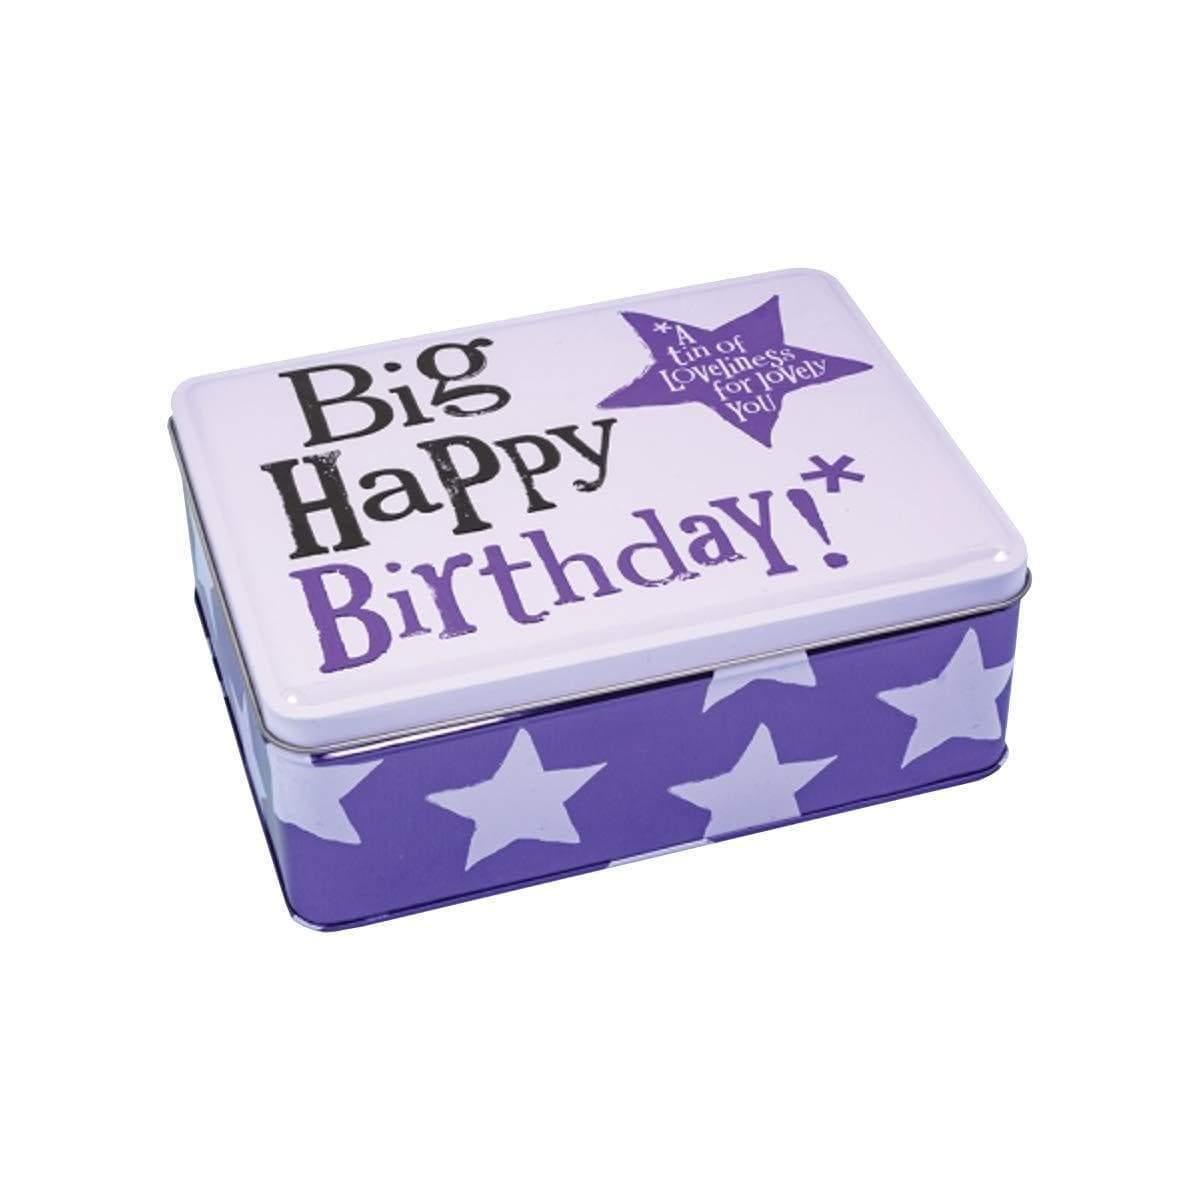 Big Happy Birthday Tin - The Bright Side